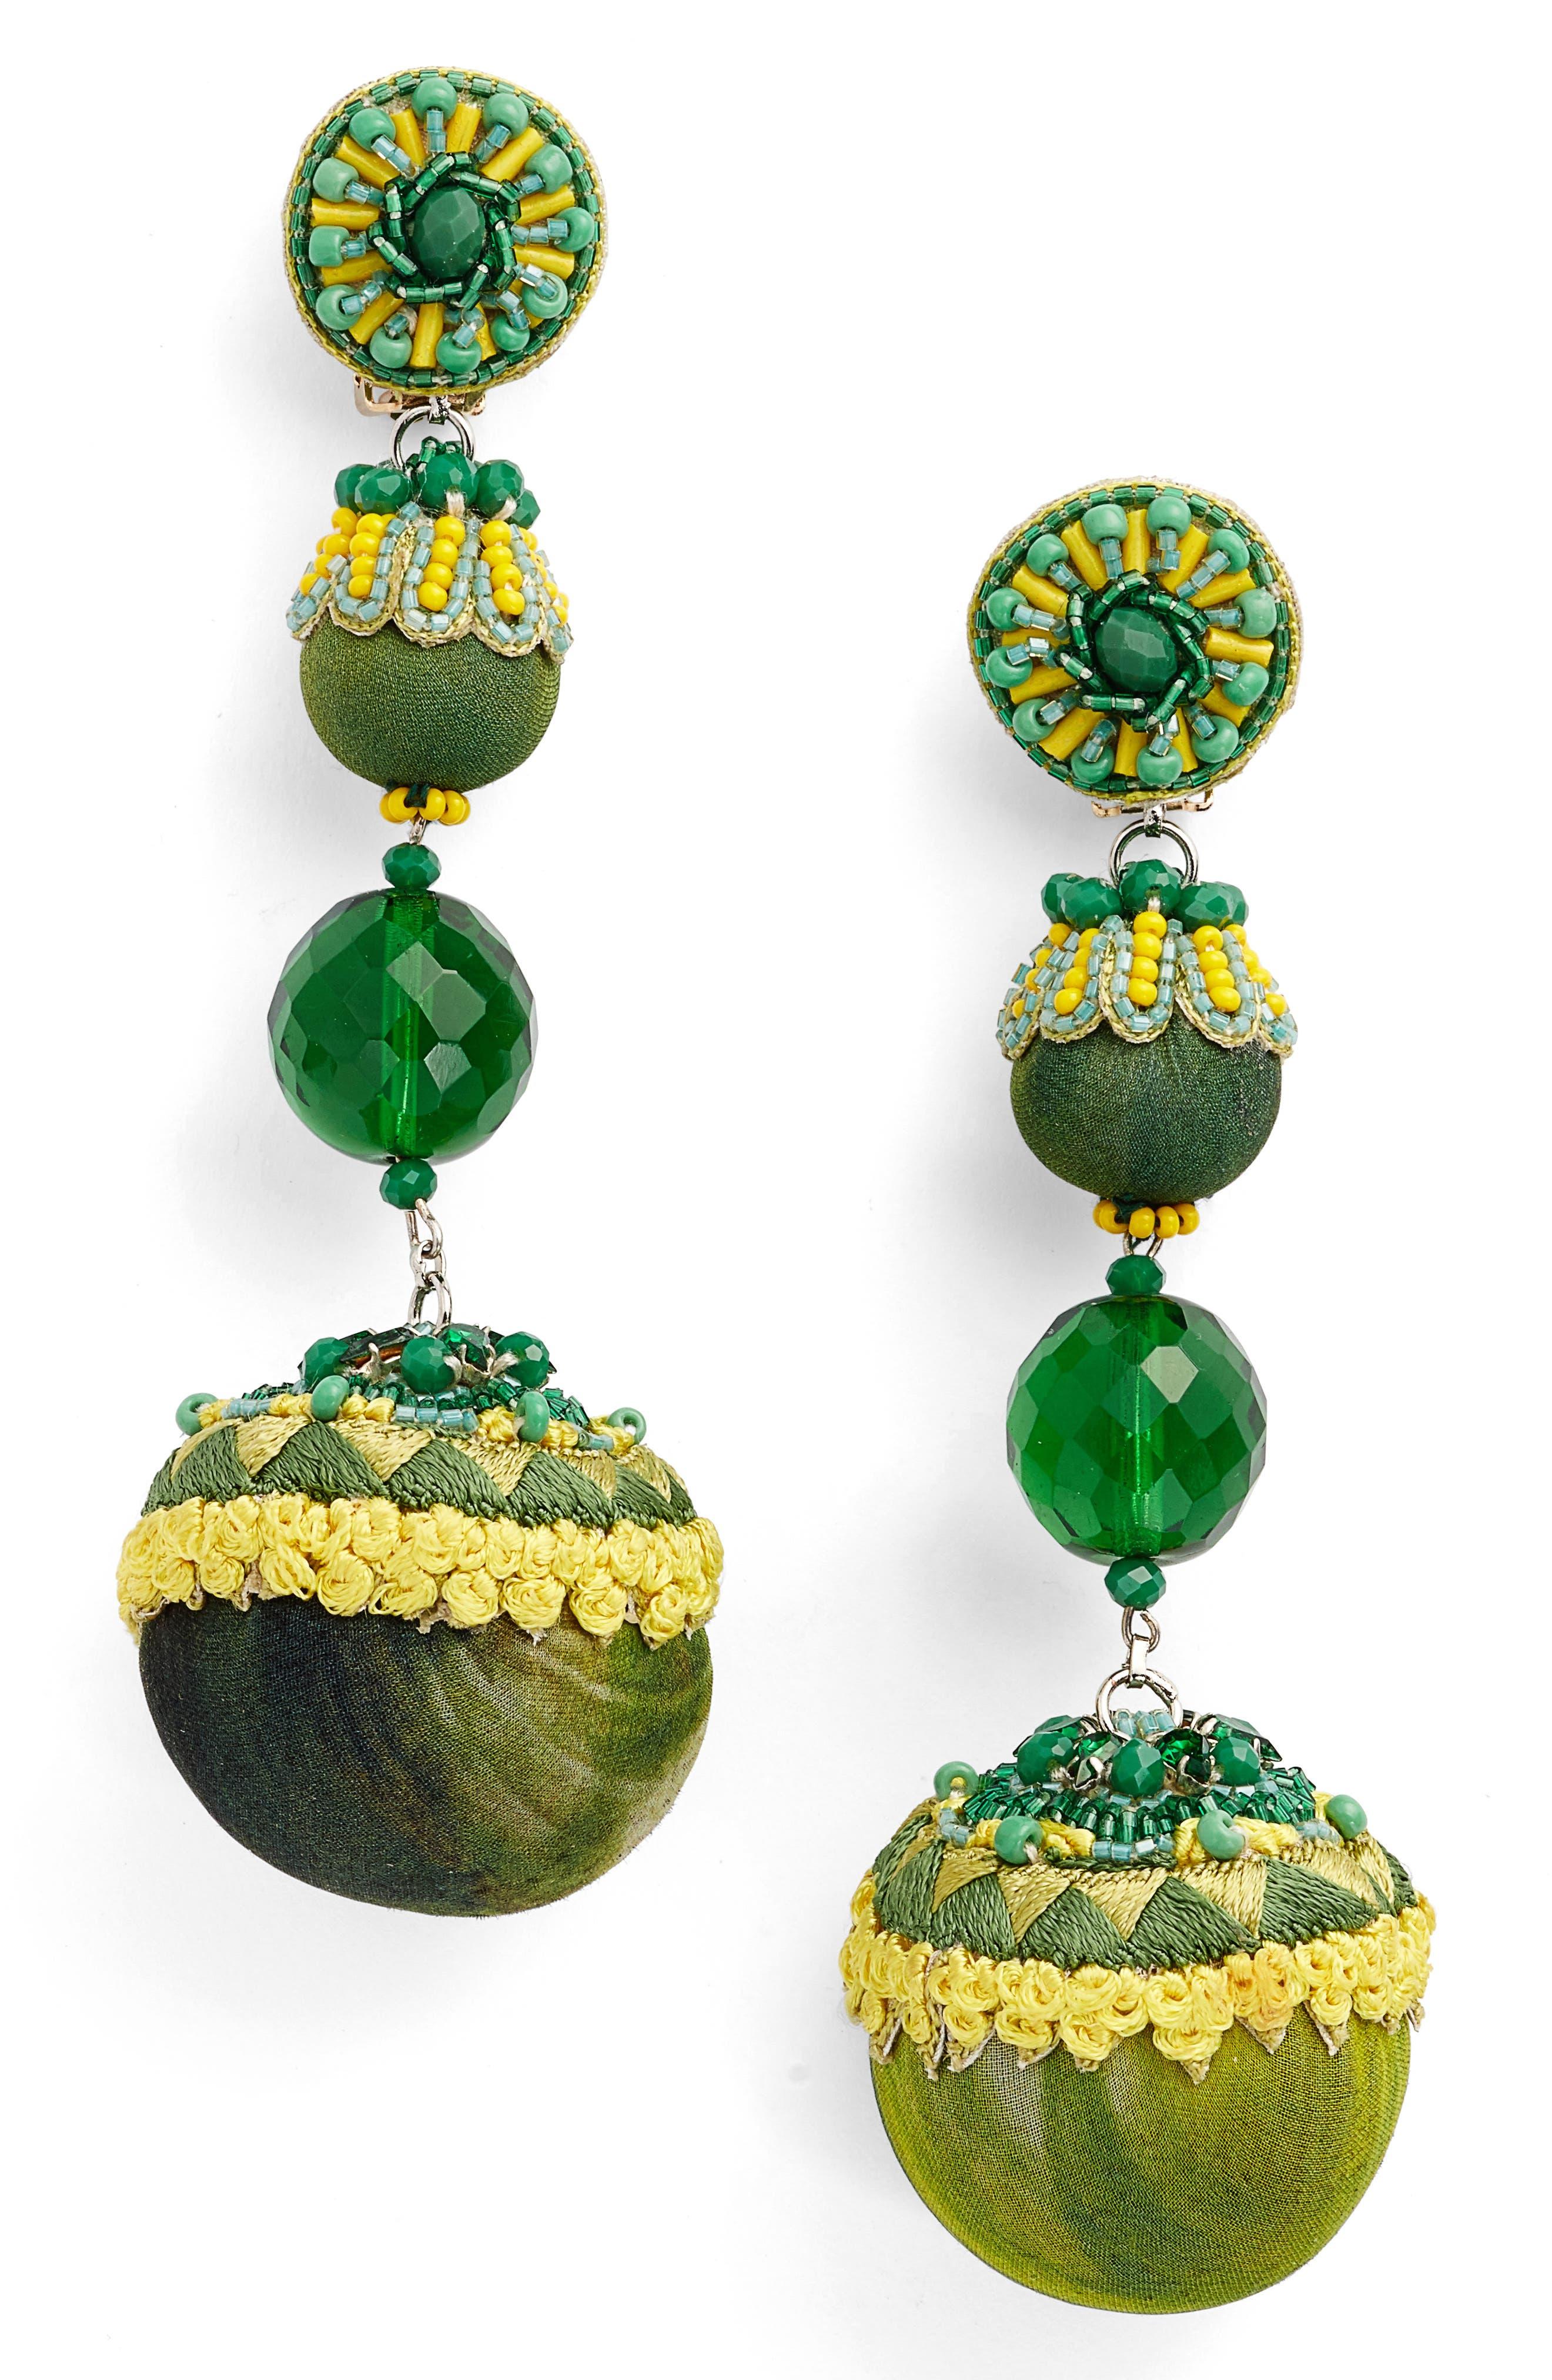 Lily Linear Earrings,                             Main thumbnail 1, color,                             300